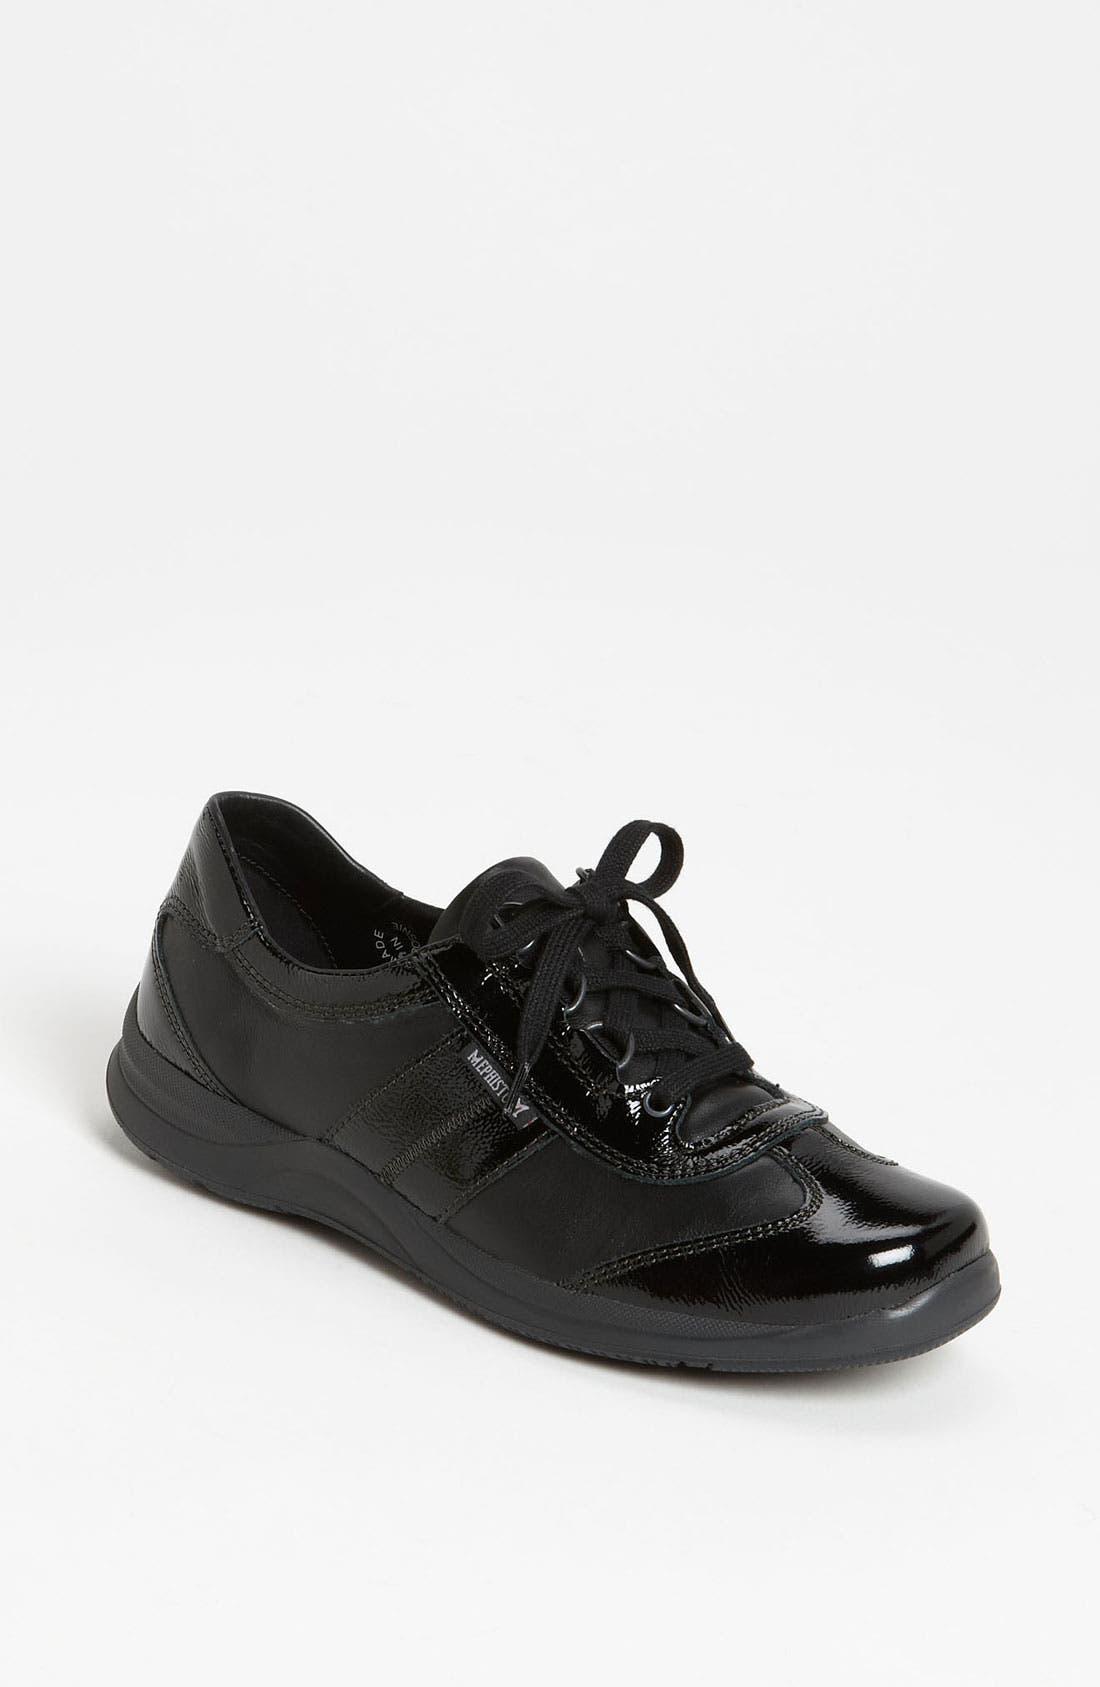 Alternate Image 1 Selected - Mephisto 'Laser' Walking Shoe (Women)